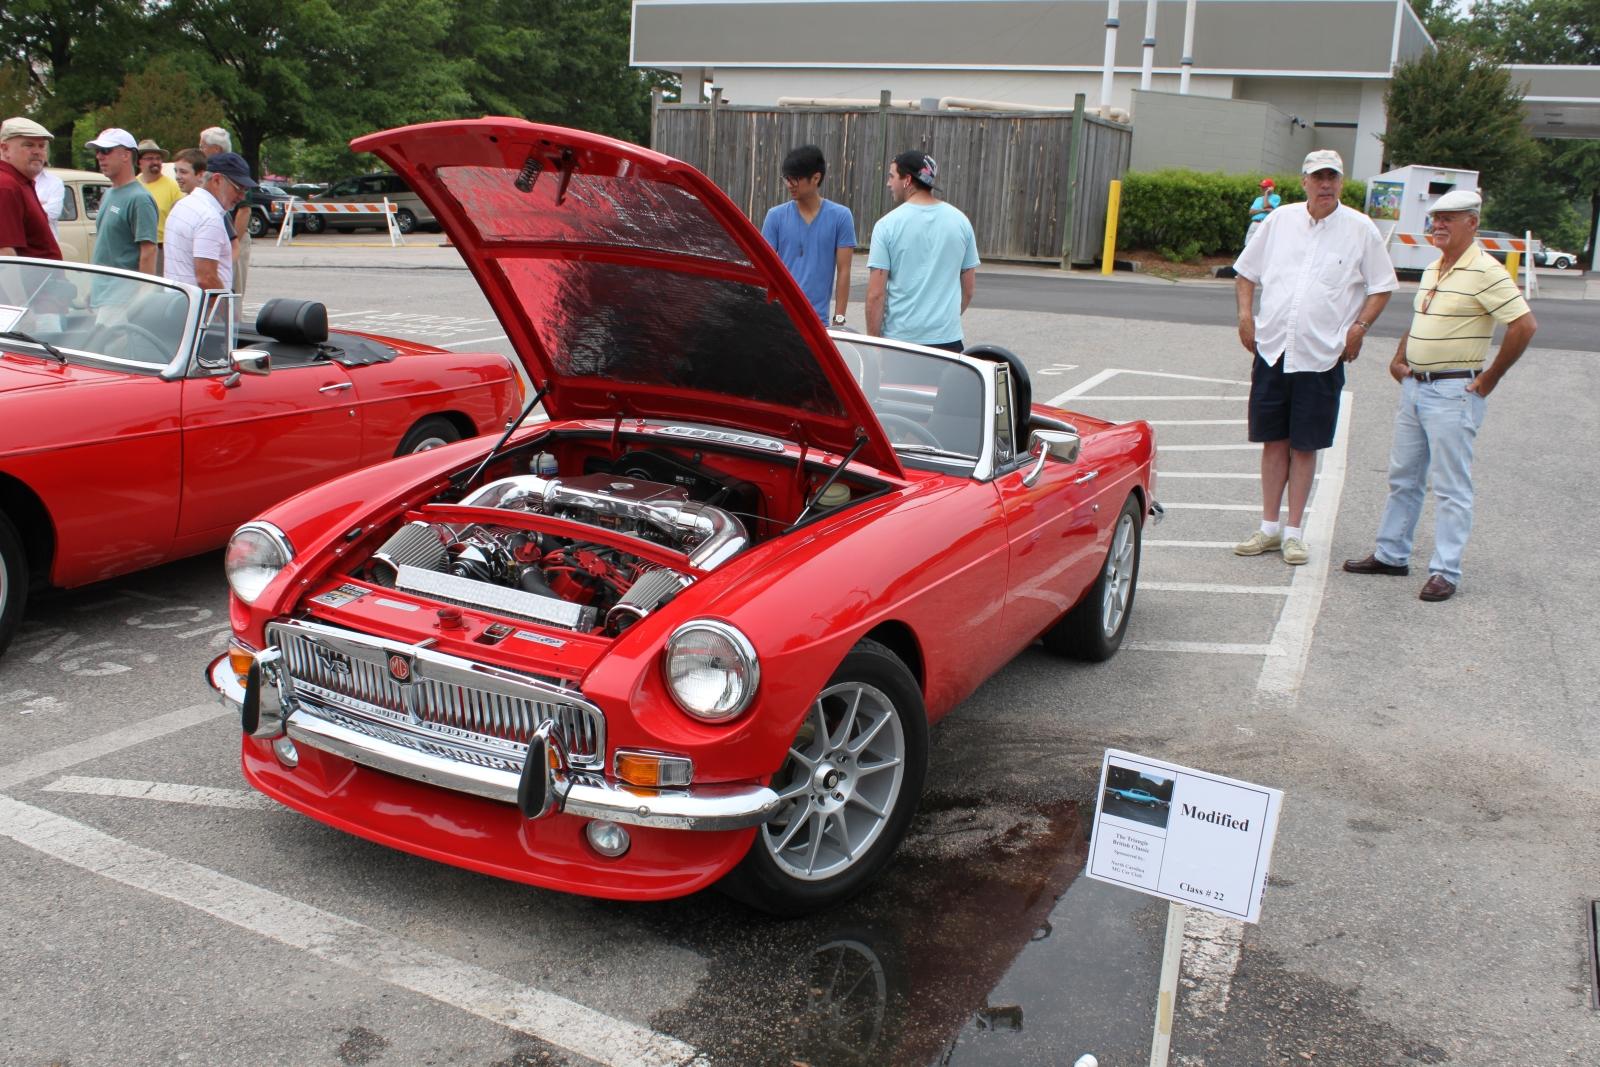 British Car Show at North Hills, 5/14/11